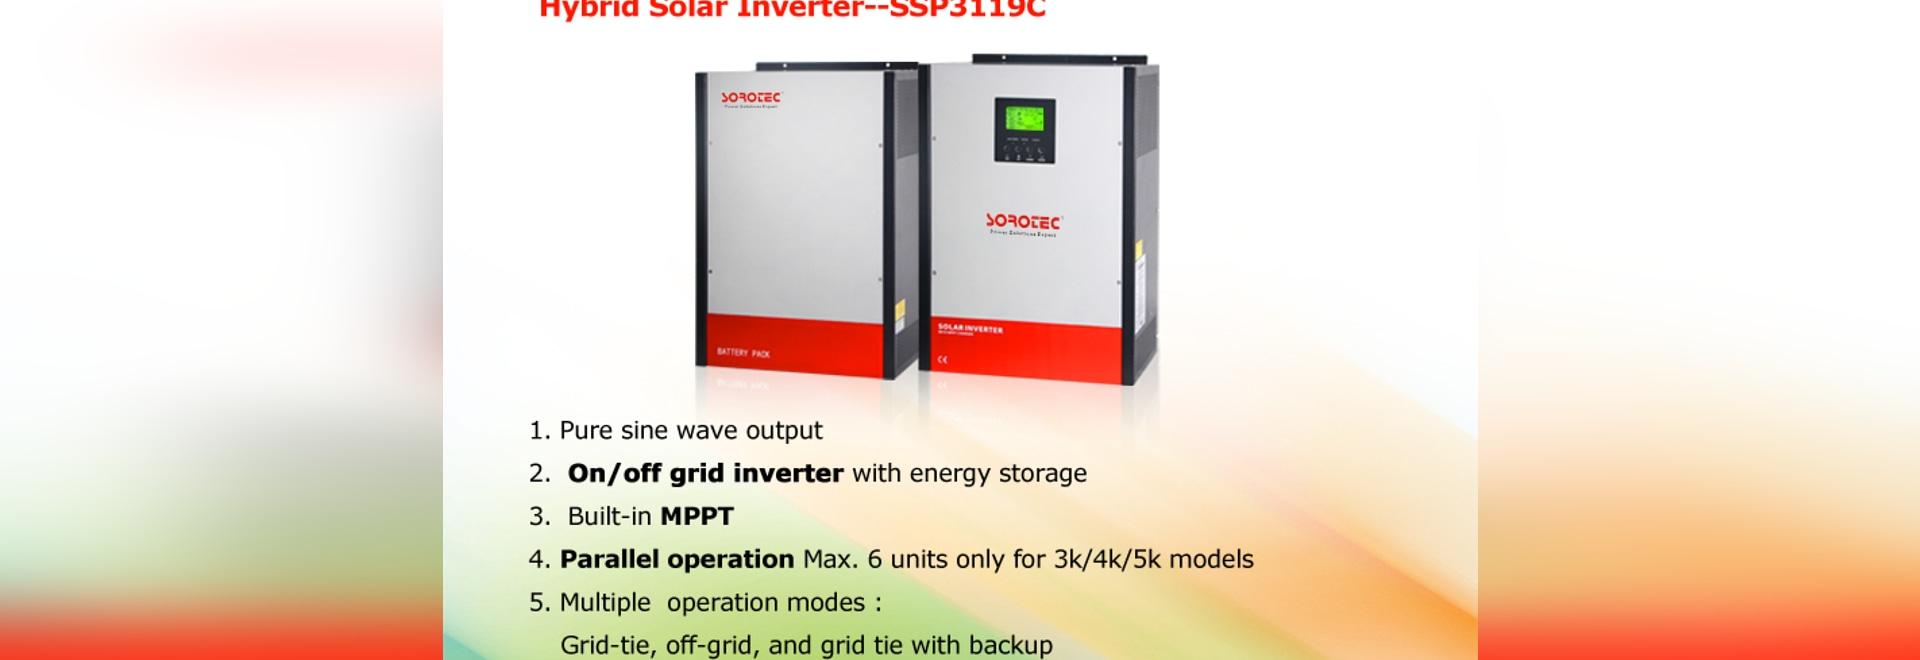 Parallel Battery Bank Solar Panel Charging System Circuit Diagram Diy Ev In Rsadiy Kva Hybrid On Off Grid Power Inverter With 1920x660